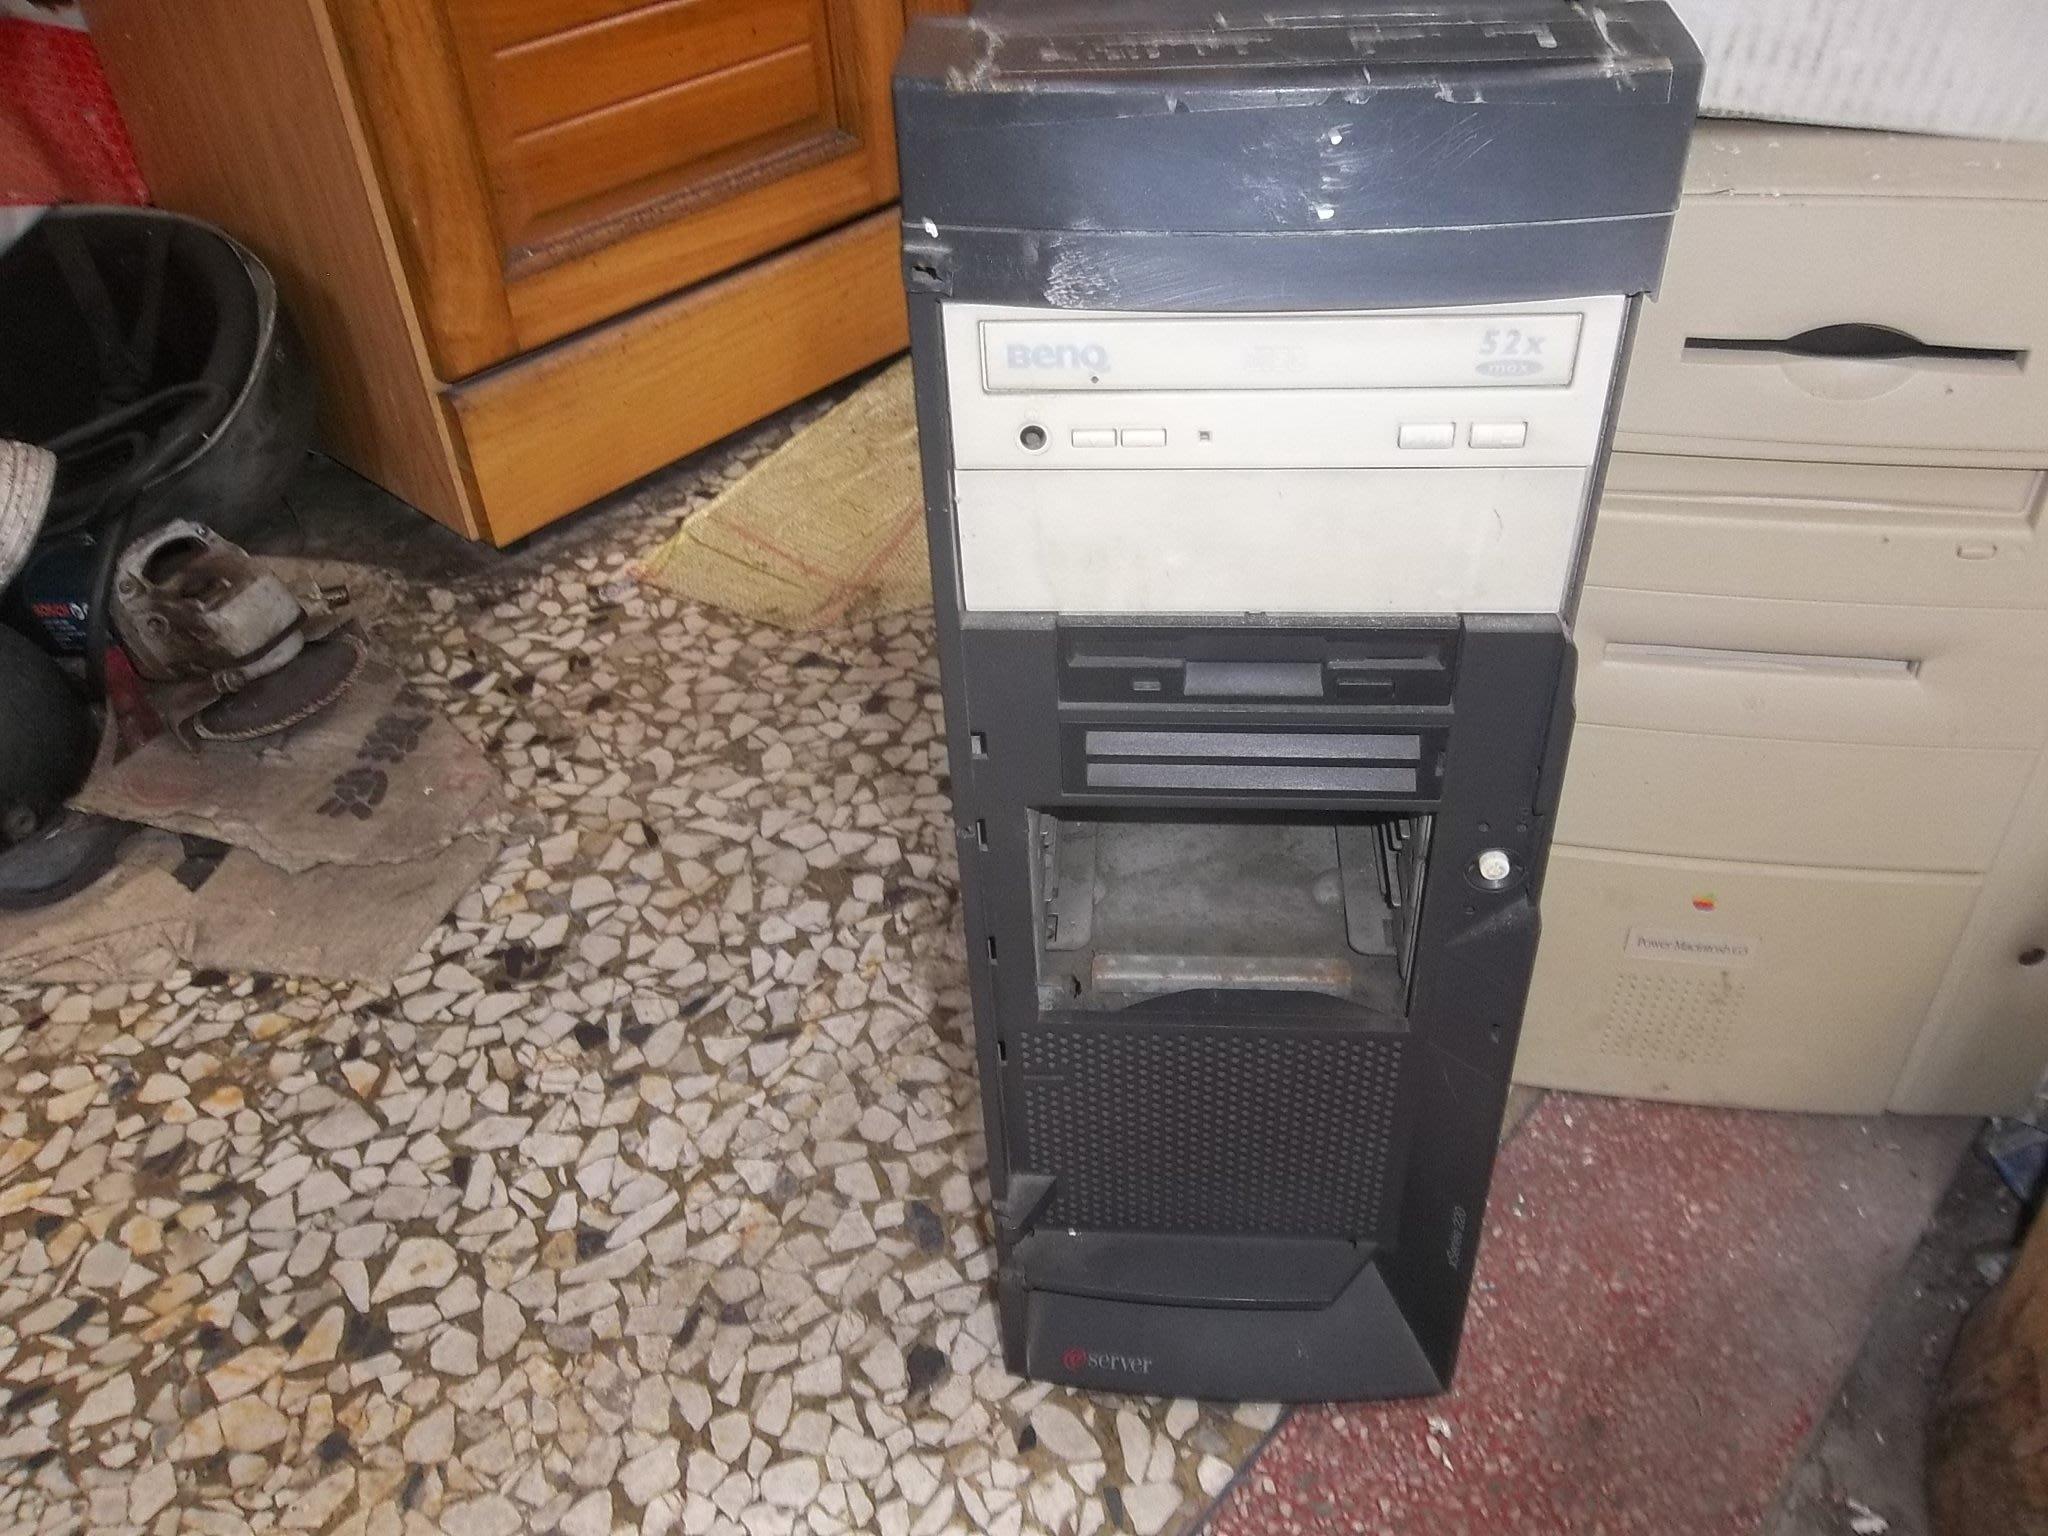 IBM,伺服器,XSERIER 220,不過電,報帳用,零件機,不保固